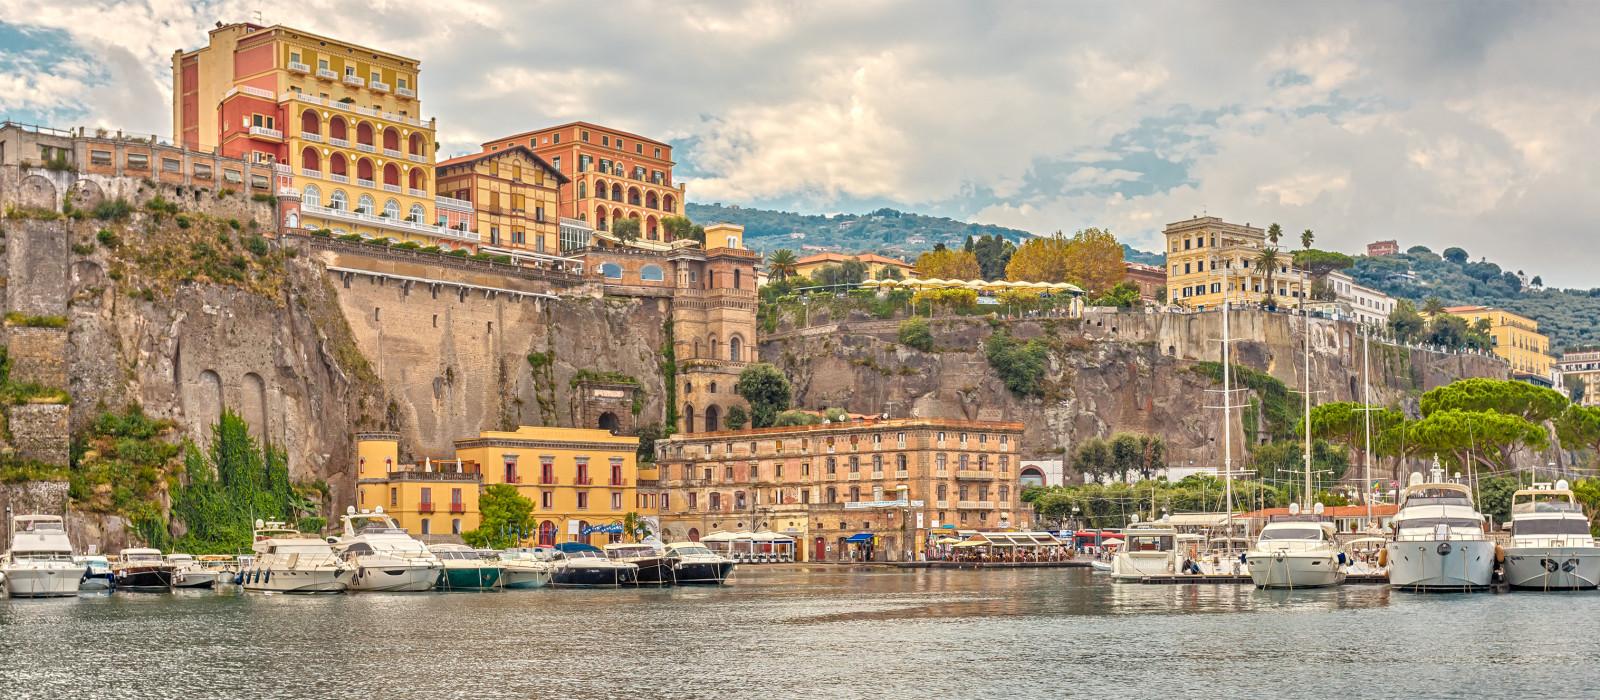 Destination Sorrento Italy